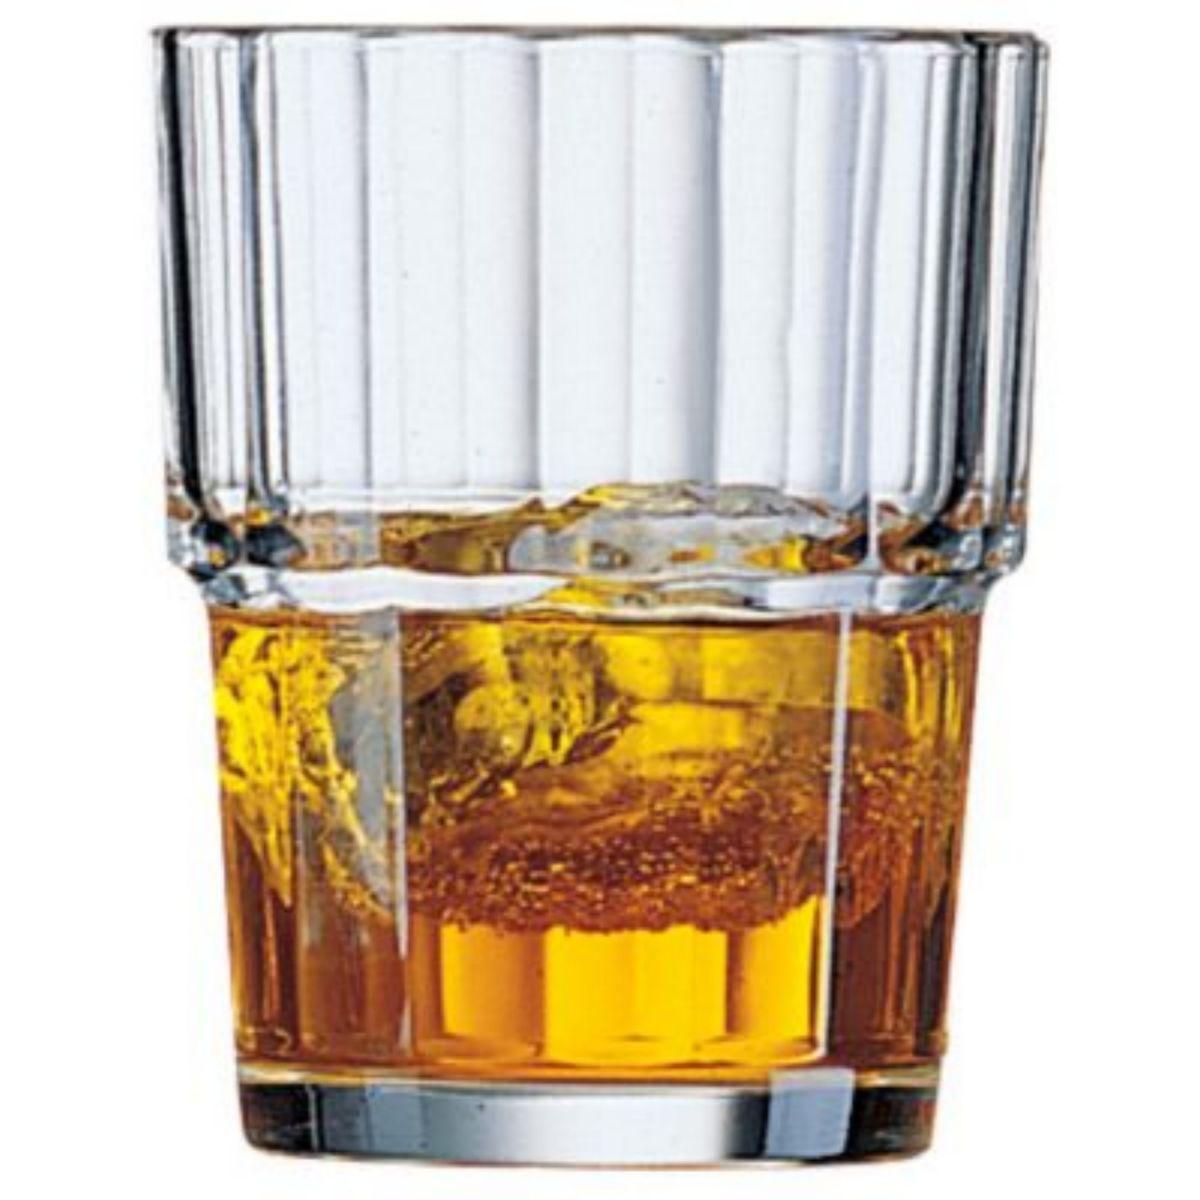 NORVEGE whiskey sklenice 20 cl